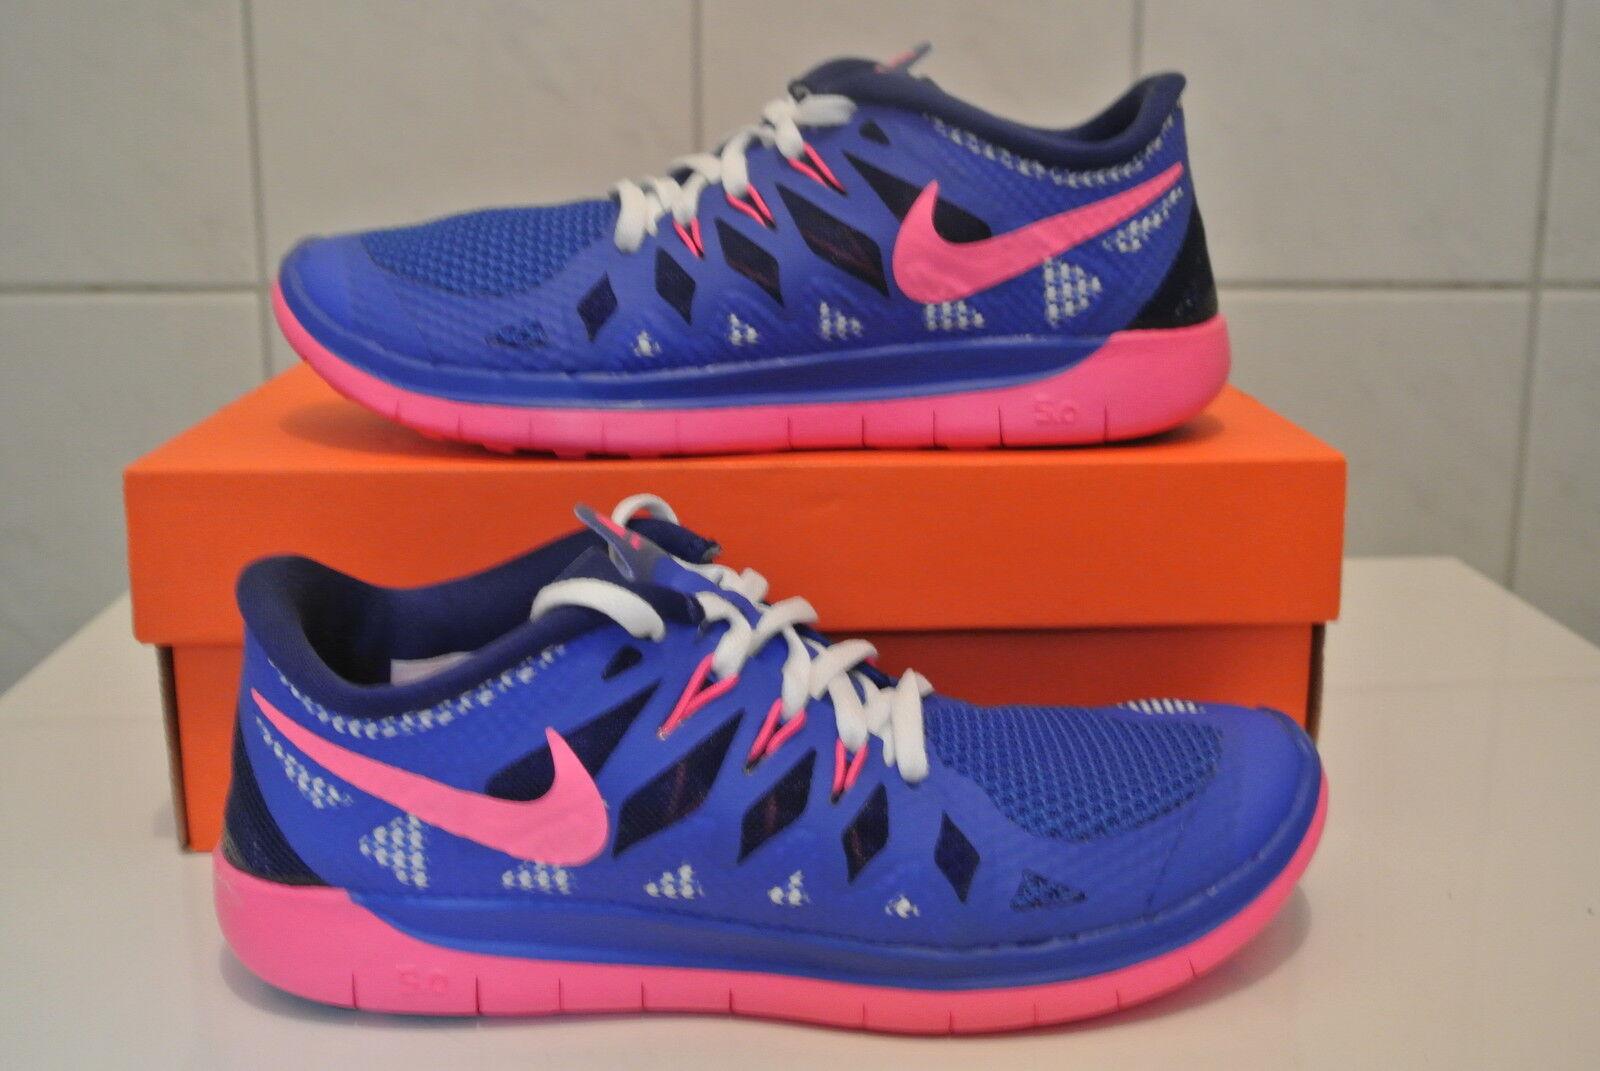 Nike Neu Free 5.0 Gr. wählbar Neu Nike & OVP 644446 400 ce847e